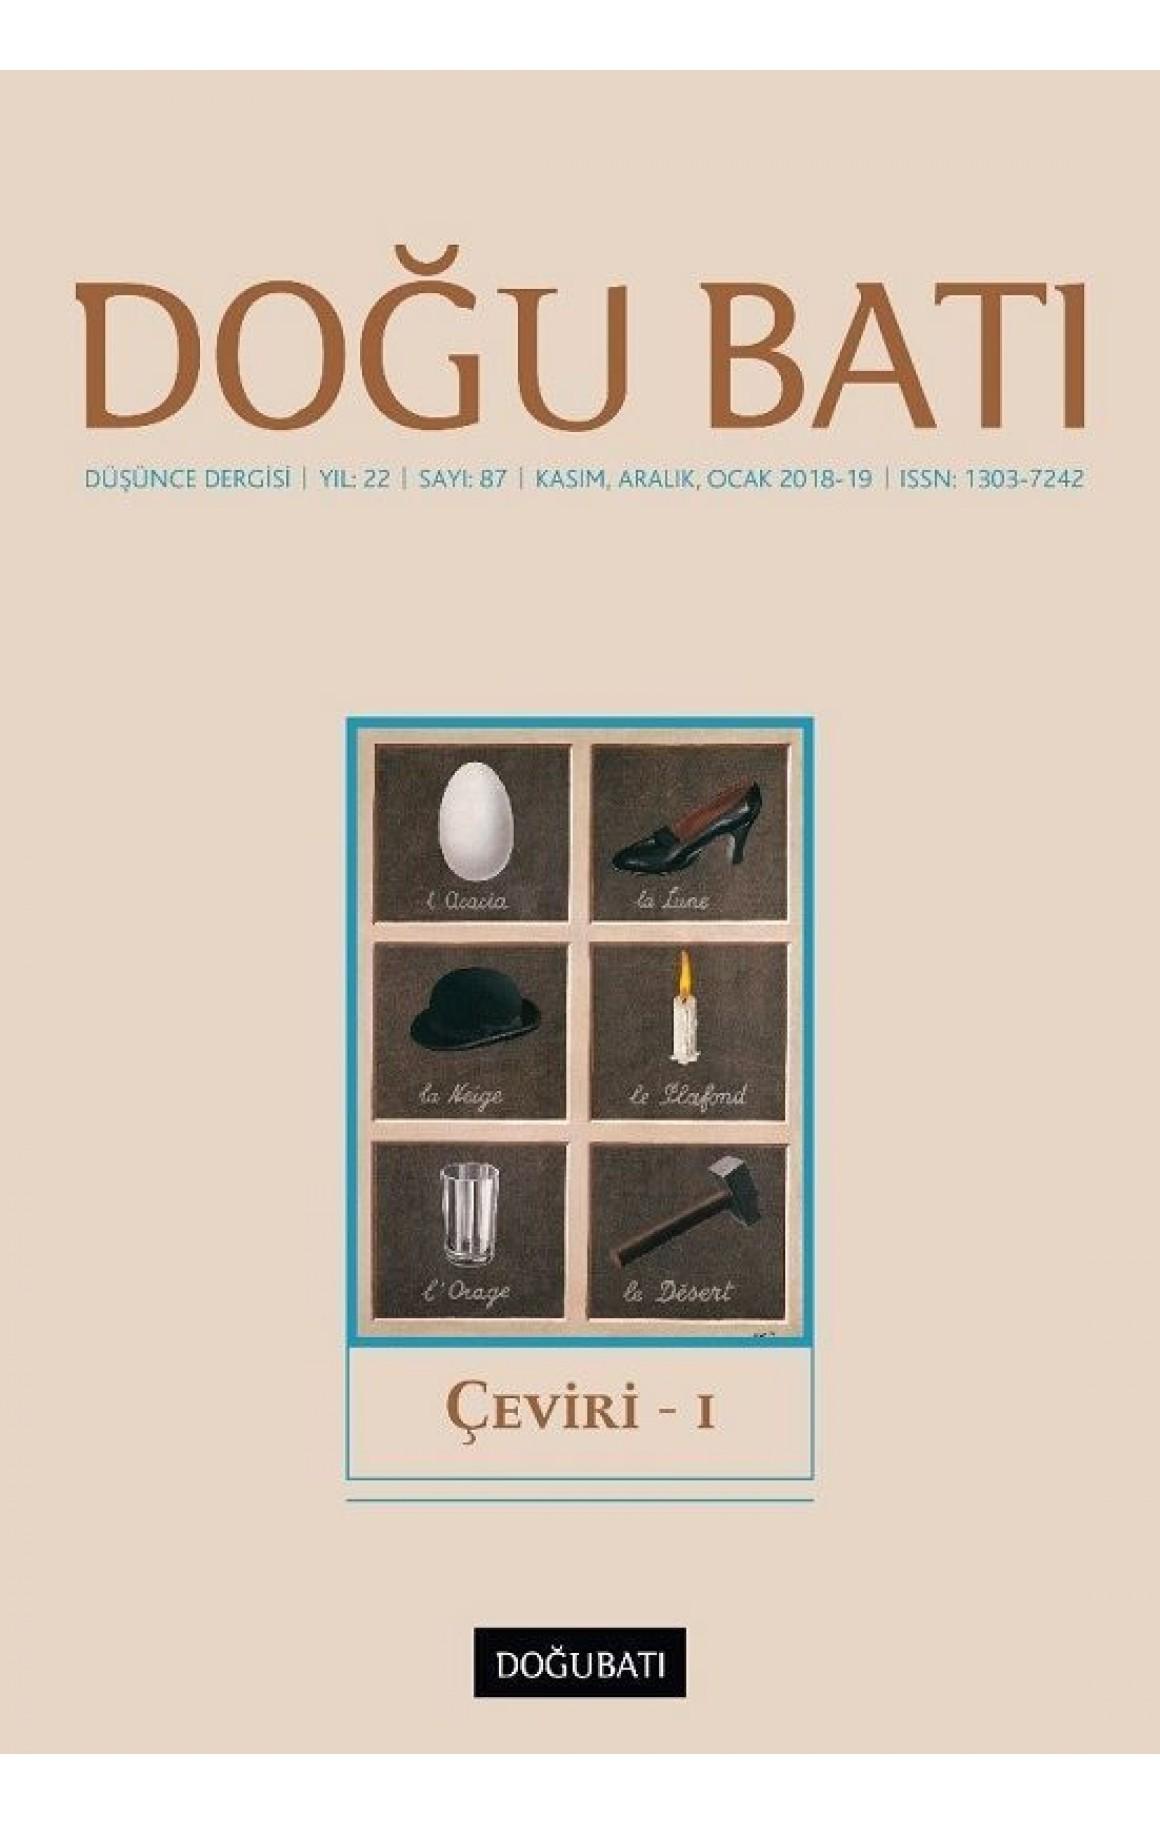 Doğu Batı Sayı 87-Çeviri 1